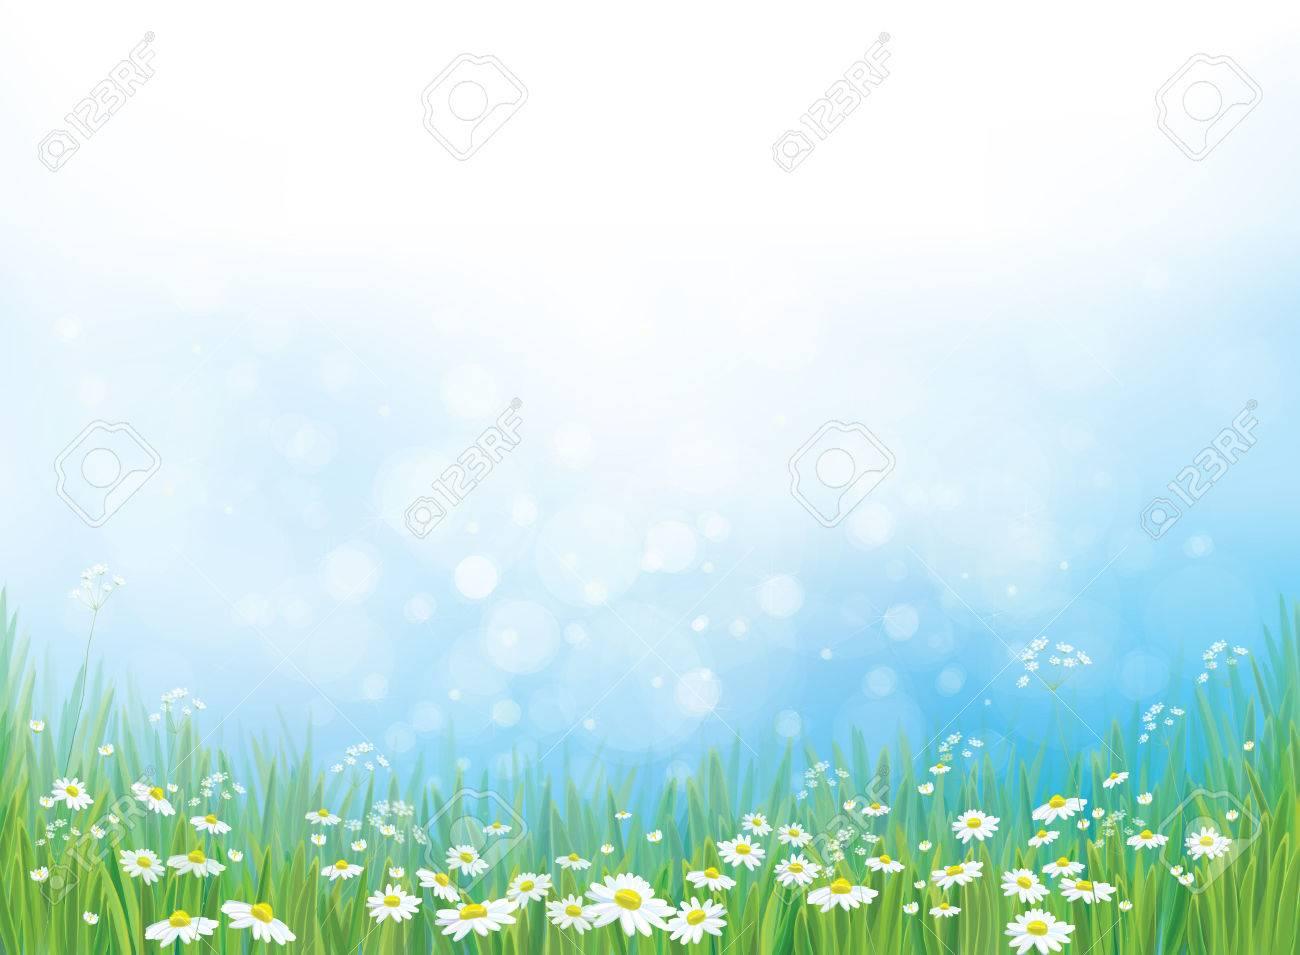 nature background, white daisy flowers on blue bokeh background. - 59120604